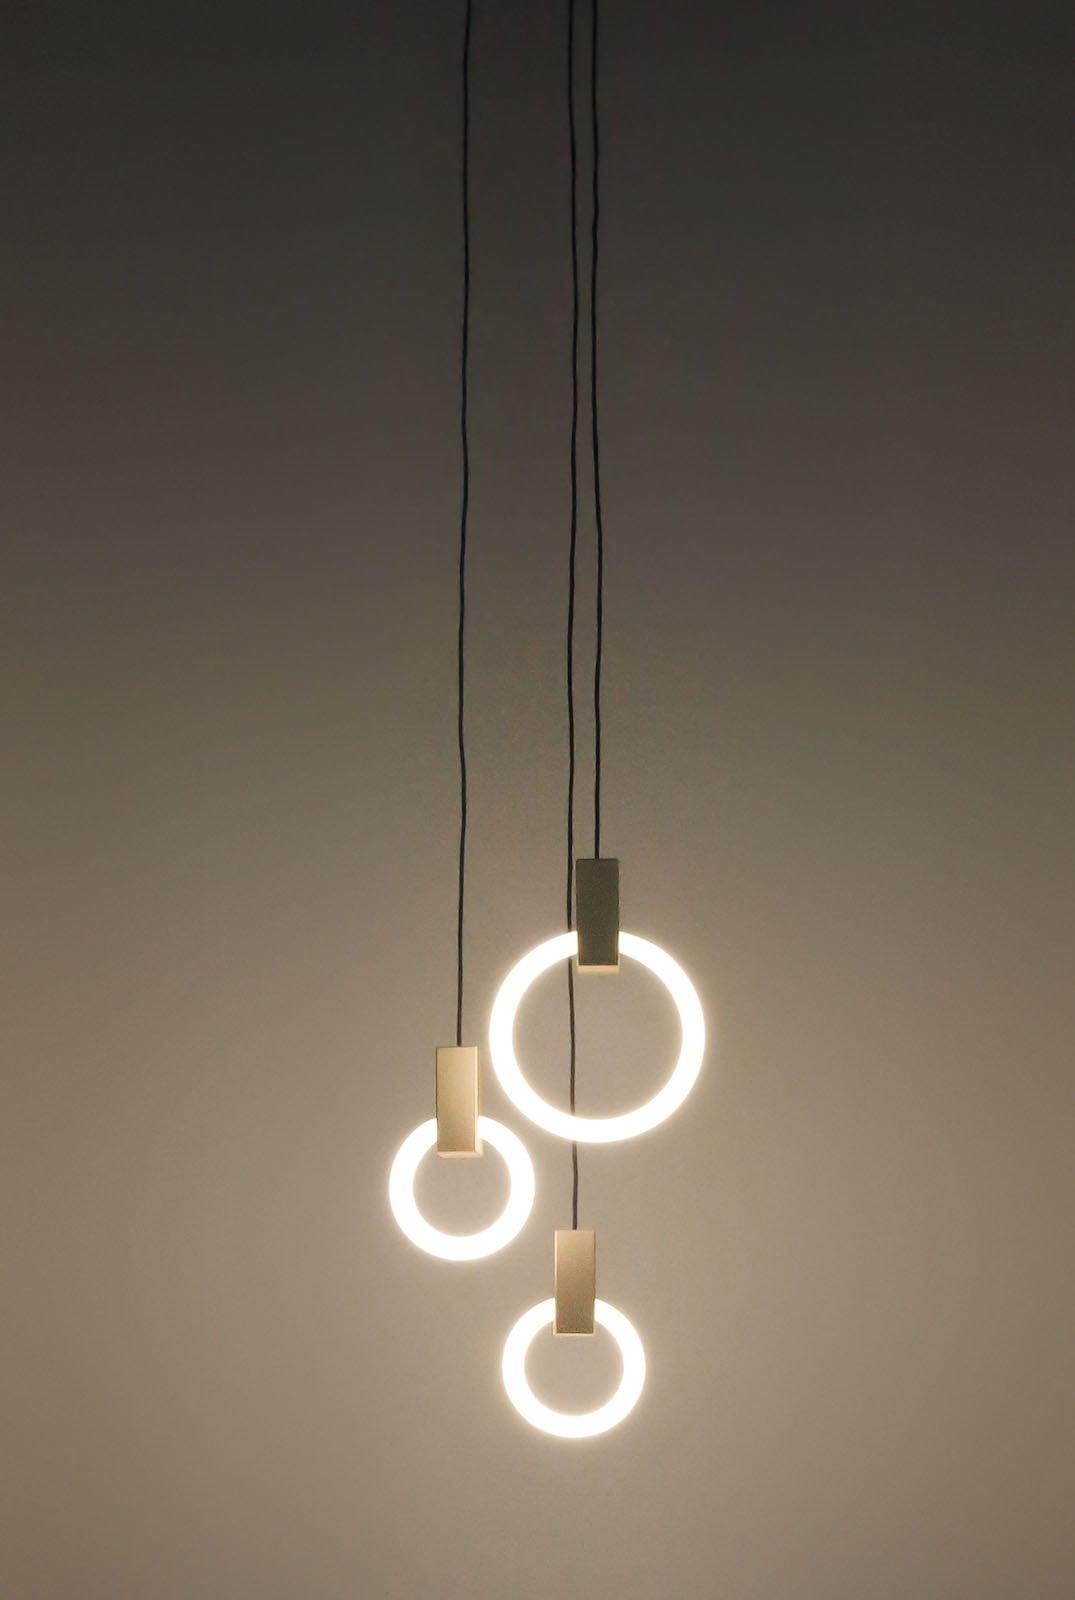 Halo Lamp By Matthew McCormick Studio